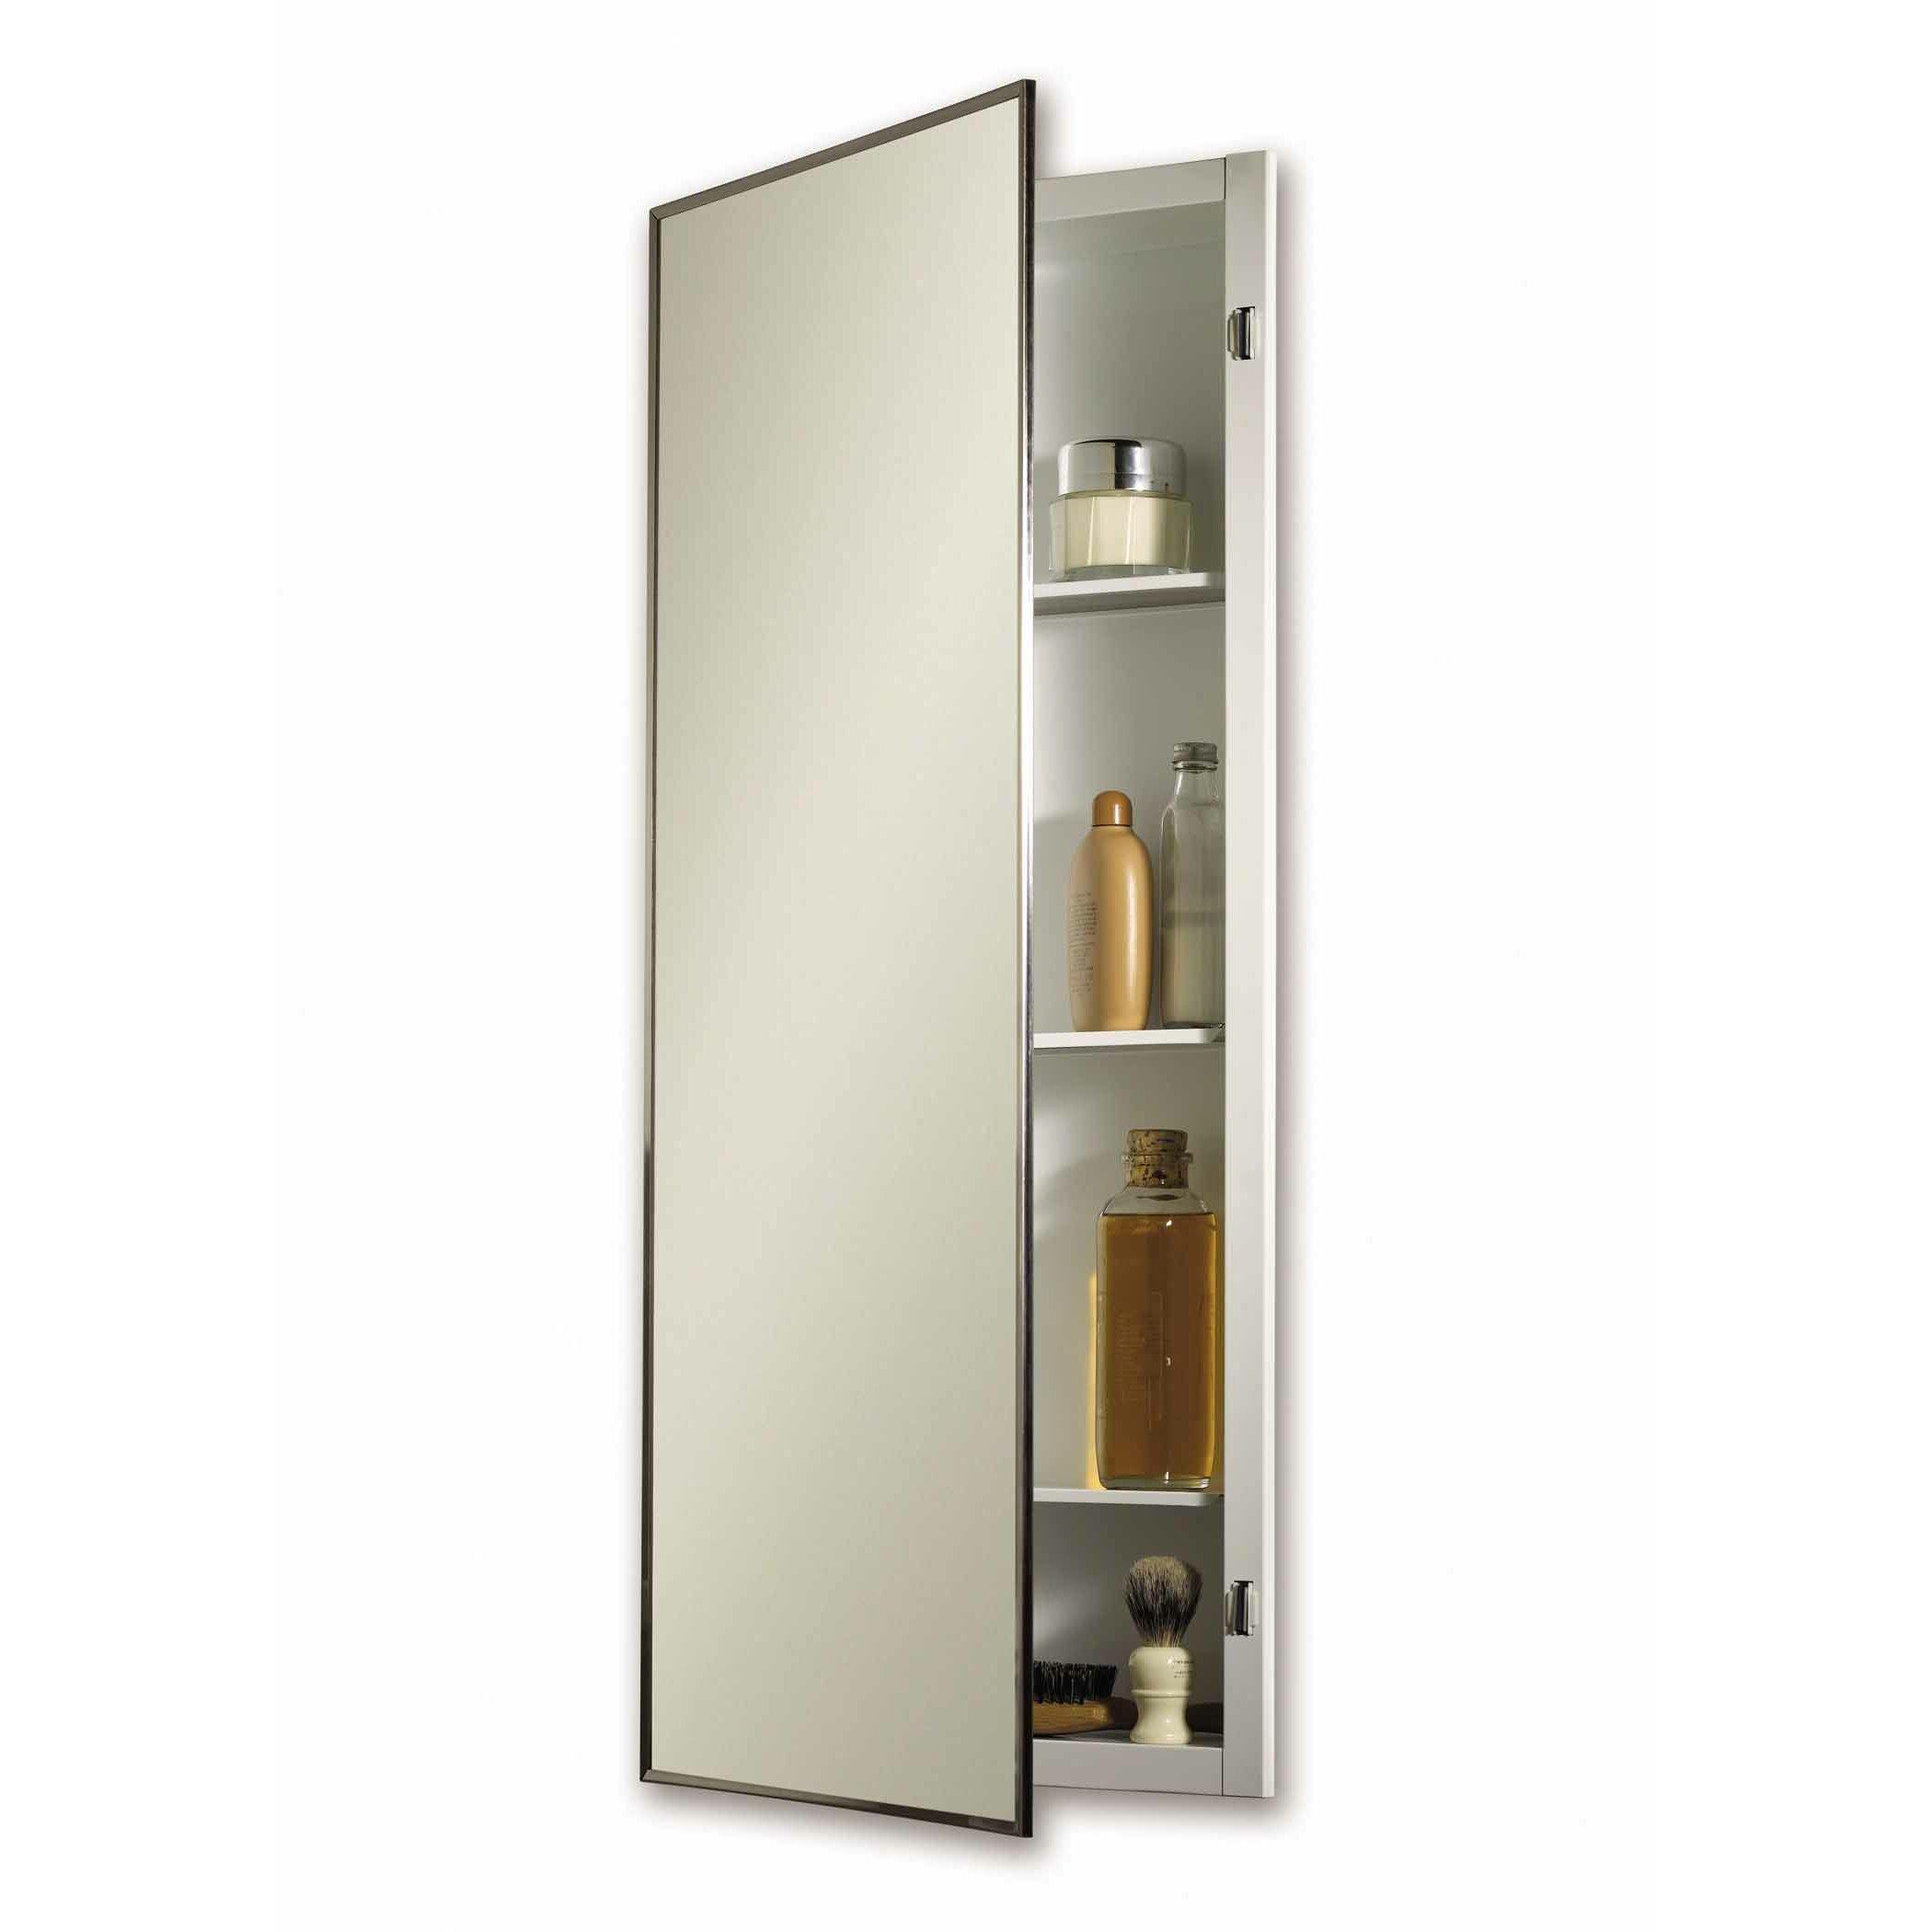 jensen 16 x 26 recessed medicine cabinet reviews wayfair. Black Bedroom Furniture Sets. Home Design Ideas